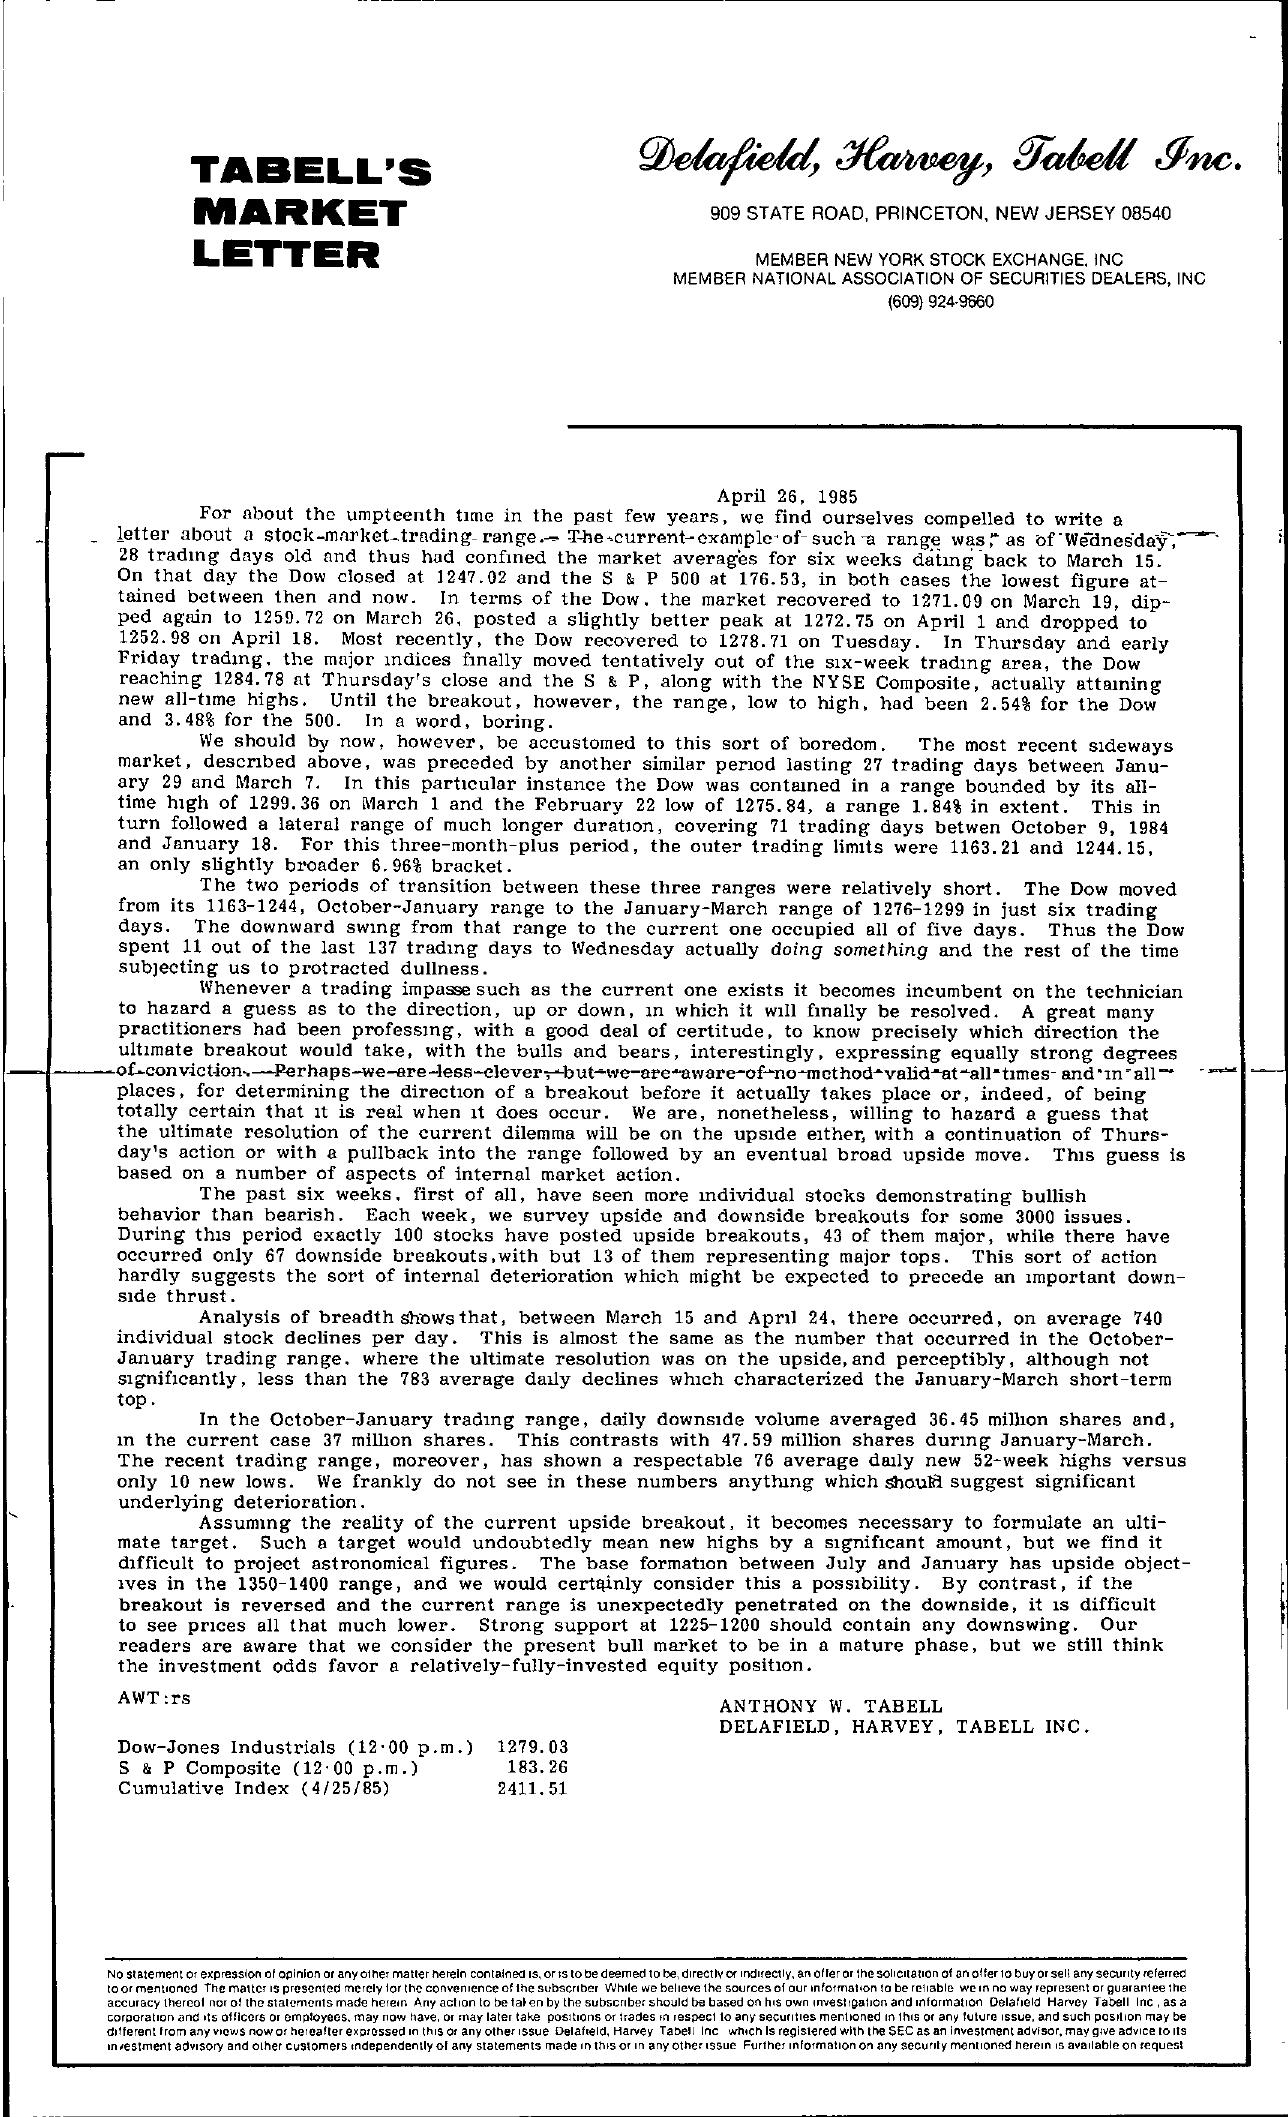 Tabell's Market Letter - April 26, 1985